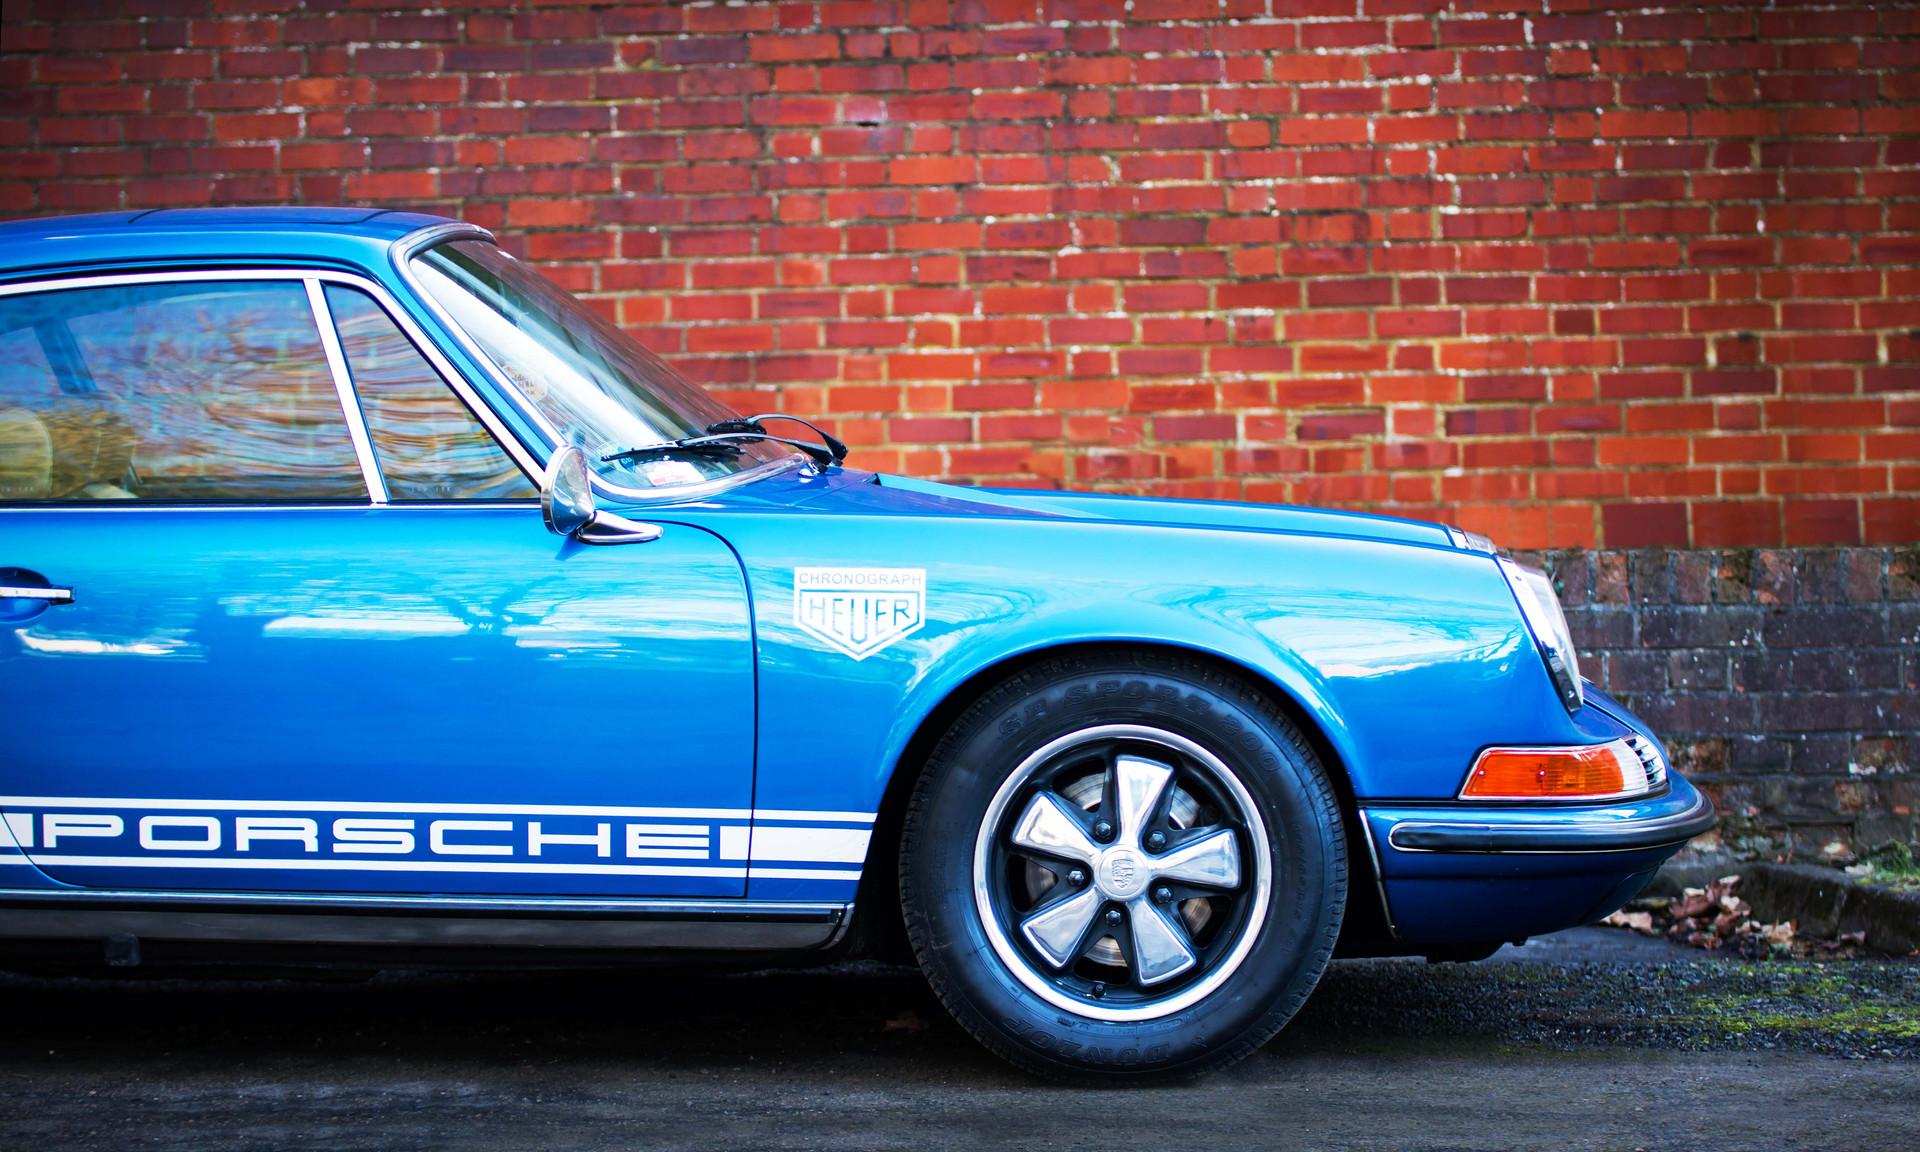 Nick Pauley's Blue Pearl Porsche 911